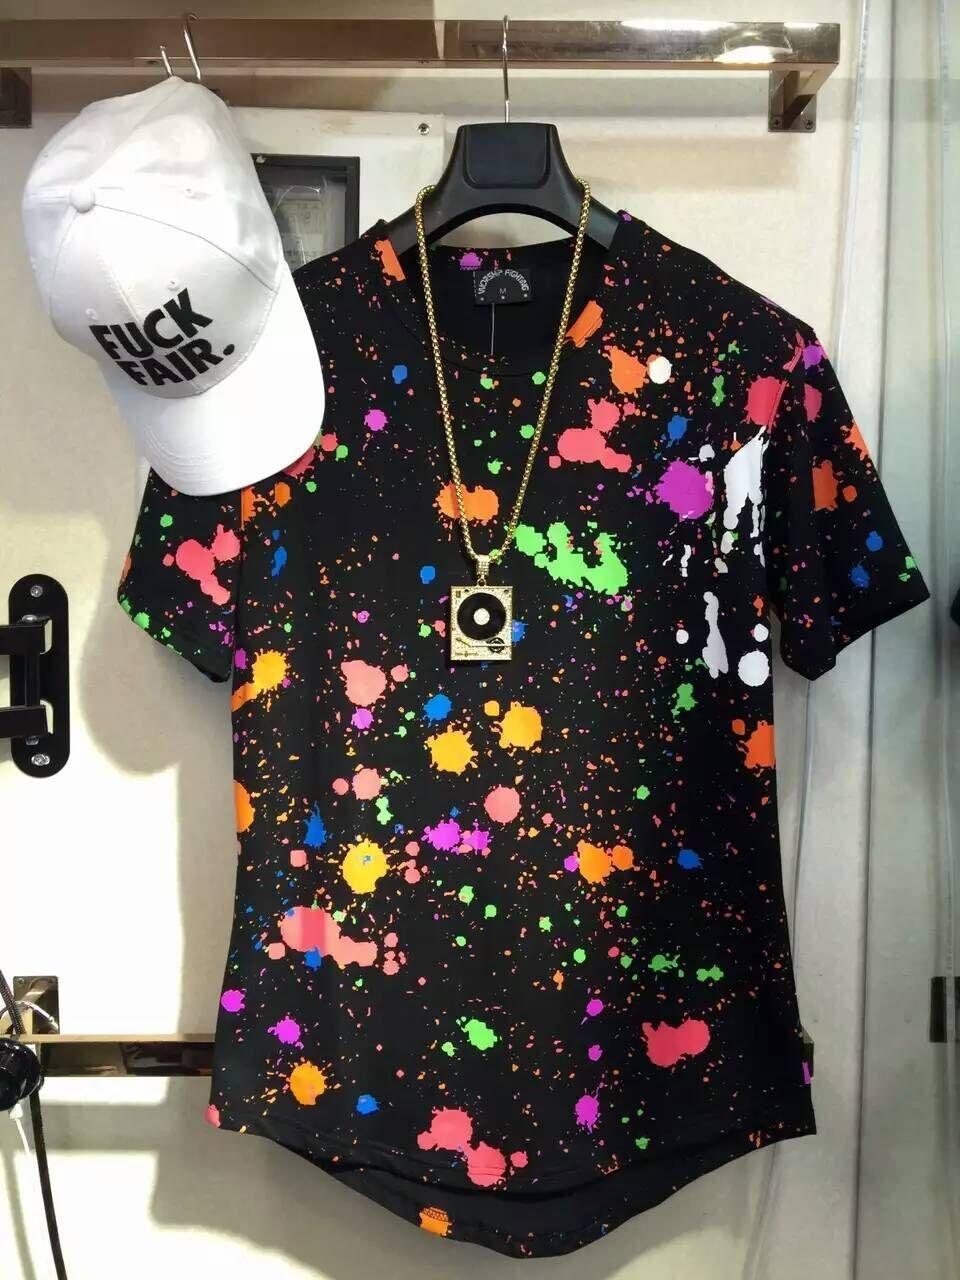 T shirt design hip hop - New Fashion Men Splash Ink Destroy Broken Short Sleeve T Shirts Hole Design Hip Hop Mens Streetwear Extended T Shirt Interesting Tee Shirts Shop For T